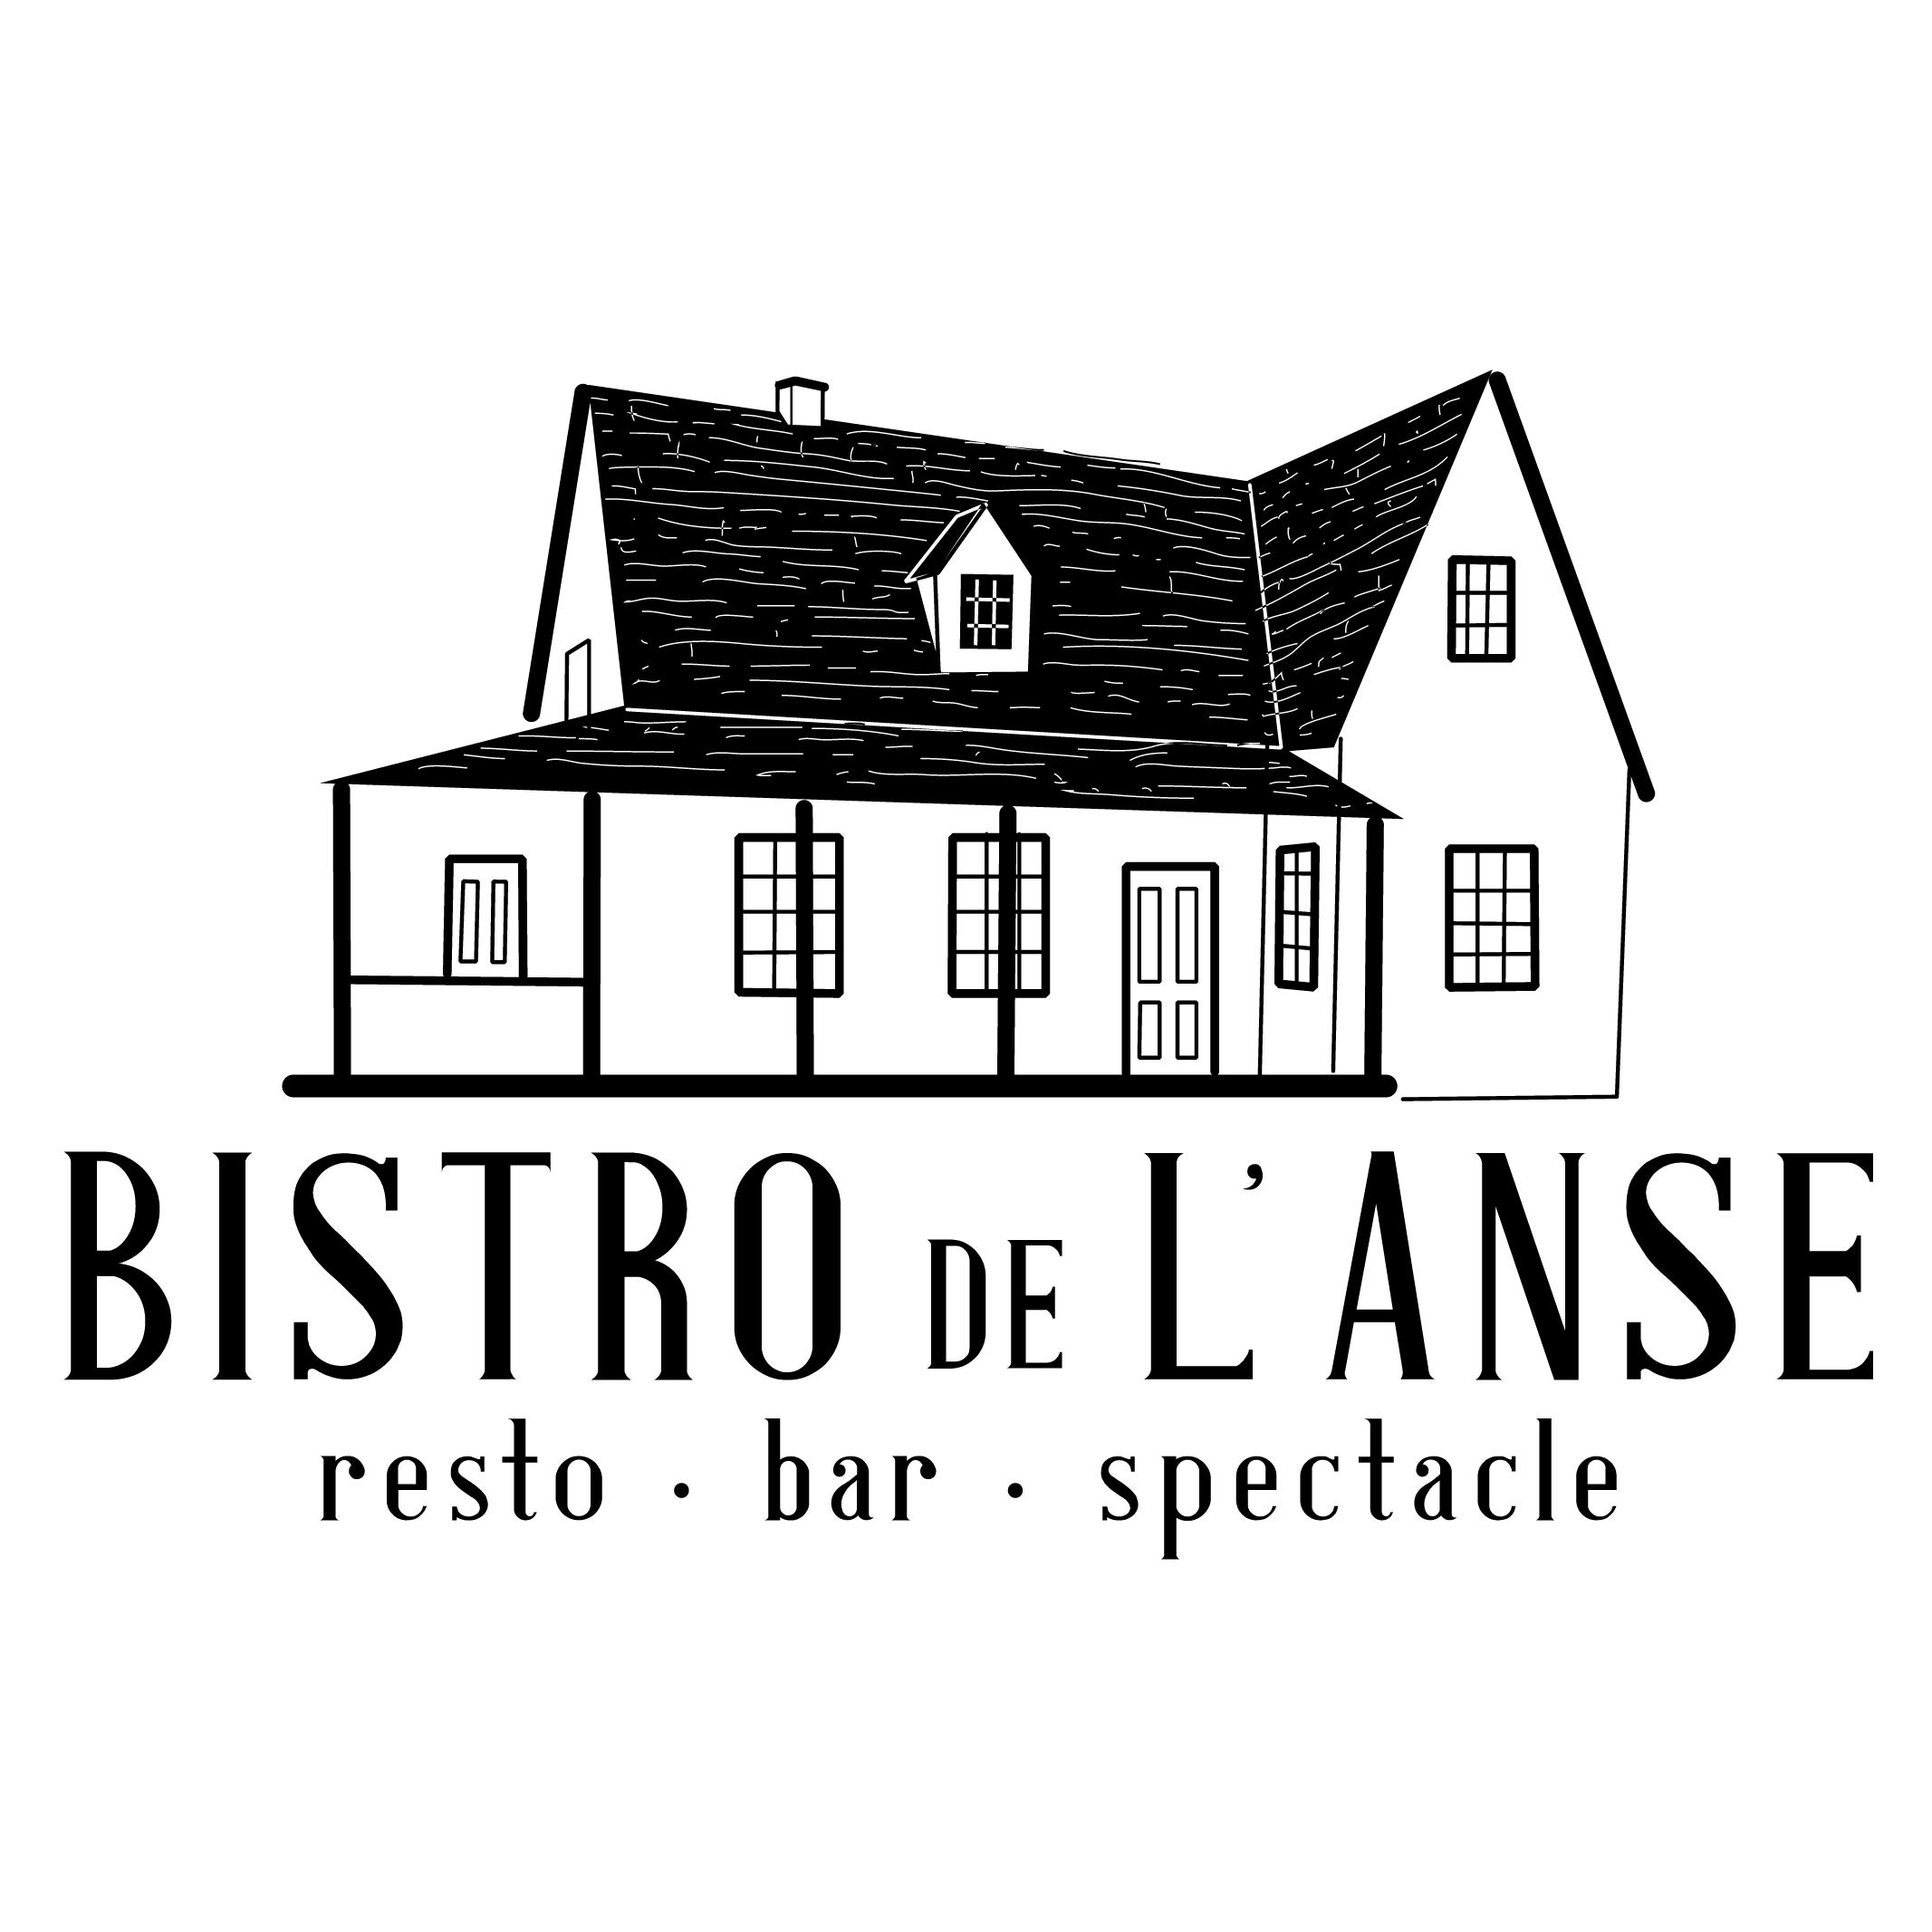 logo de Bistro de la Chasse-Pinte